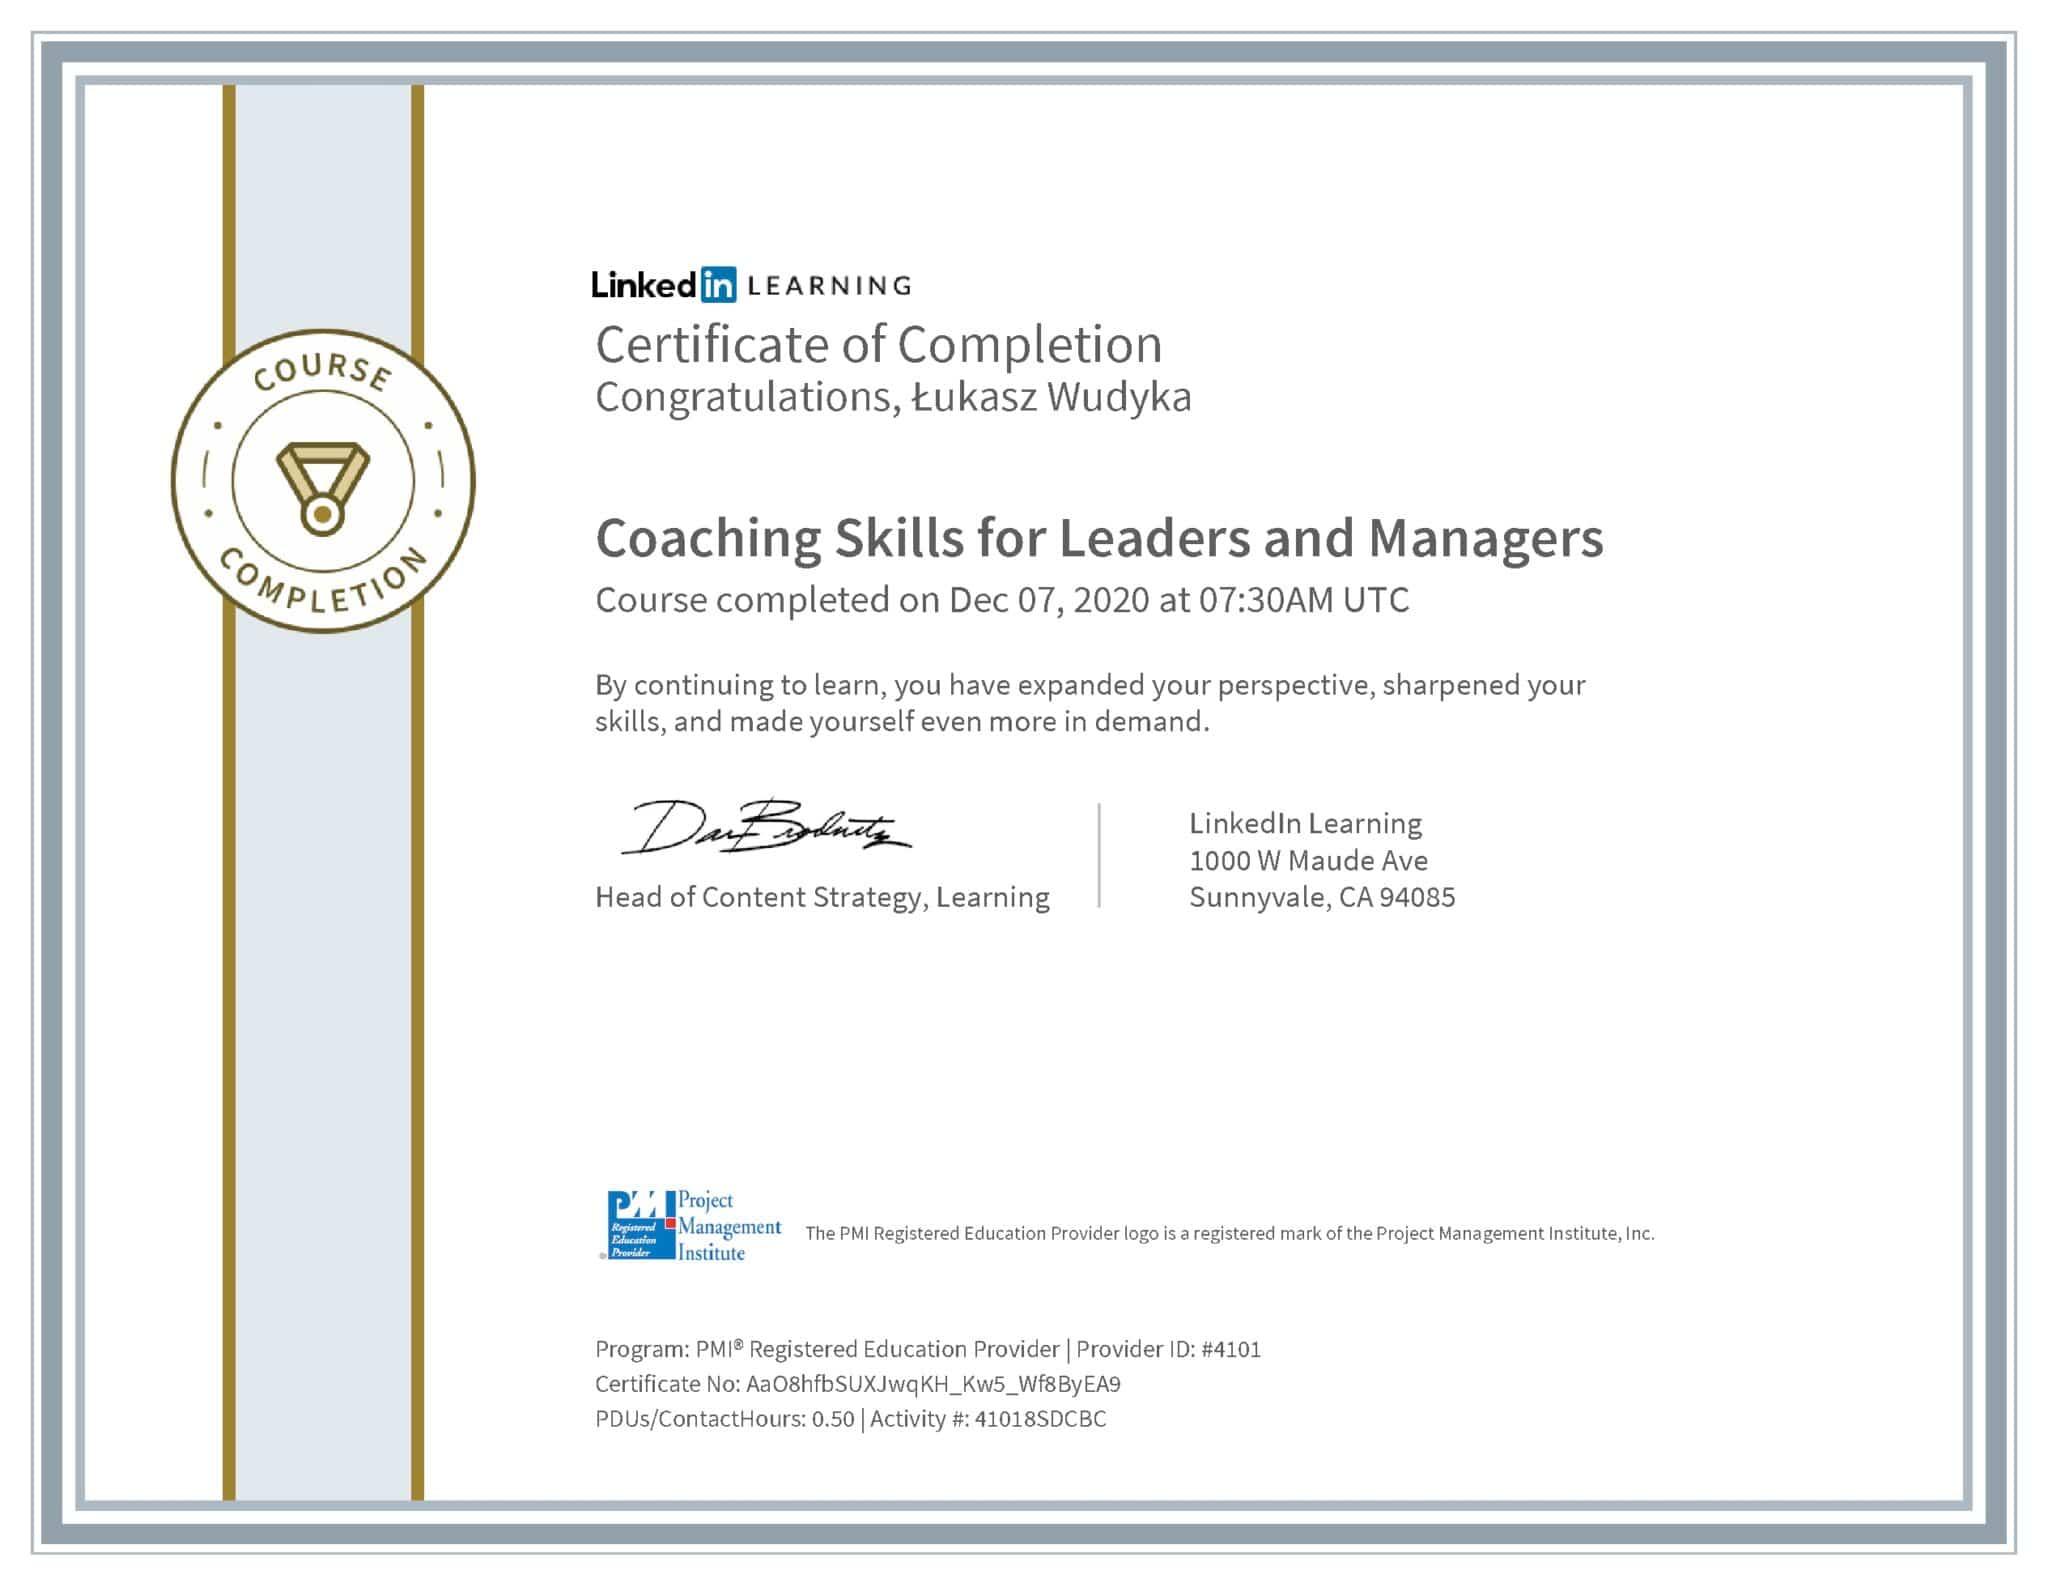 Łukasz Wudyka certyfikat LinkedIn Coaching Skills for Leaders and Managers PMI